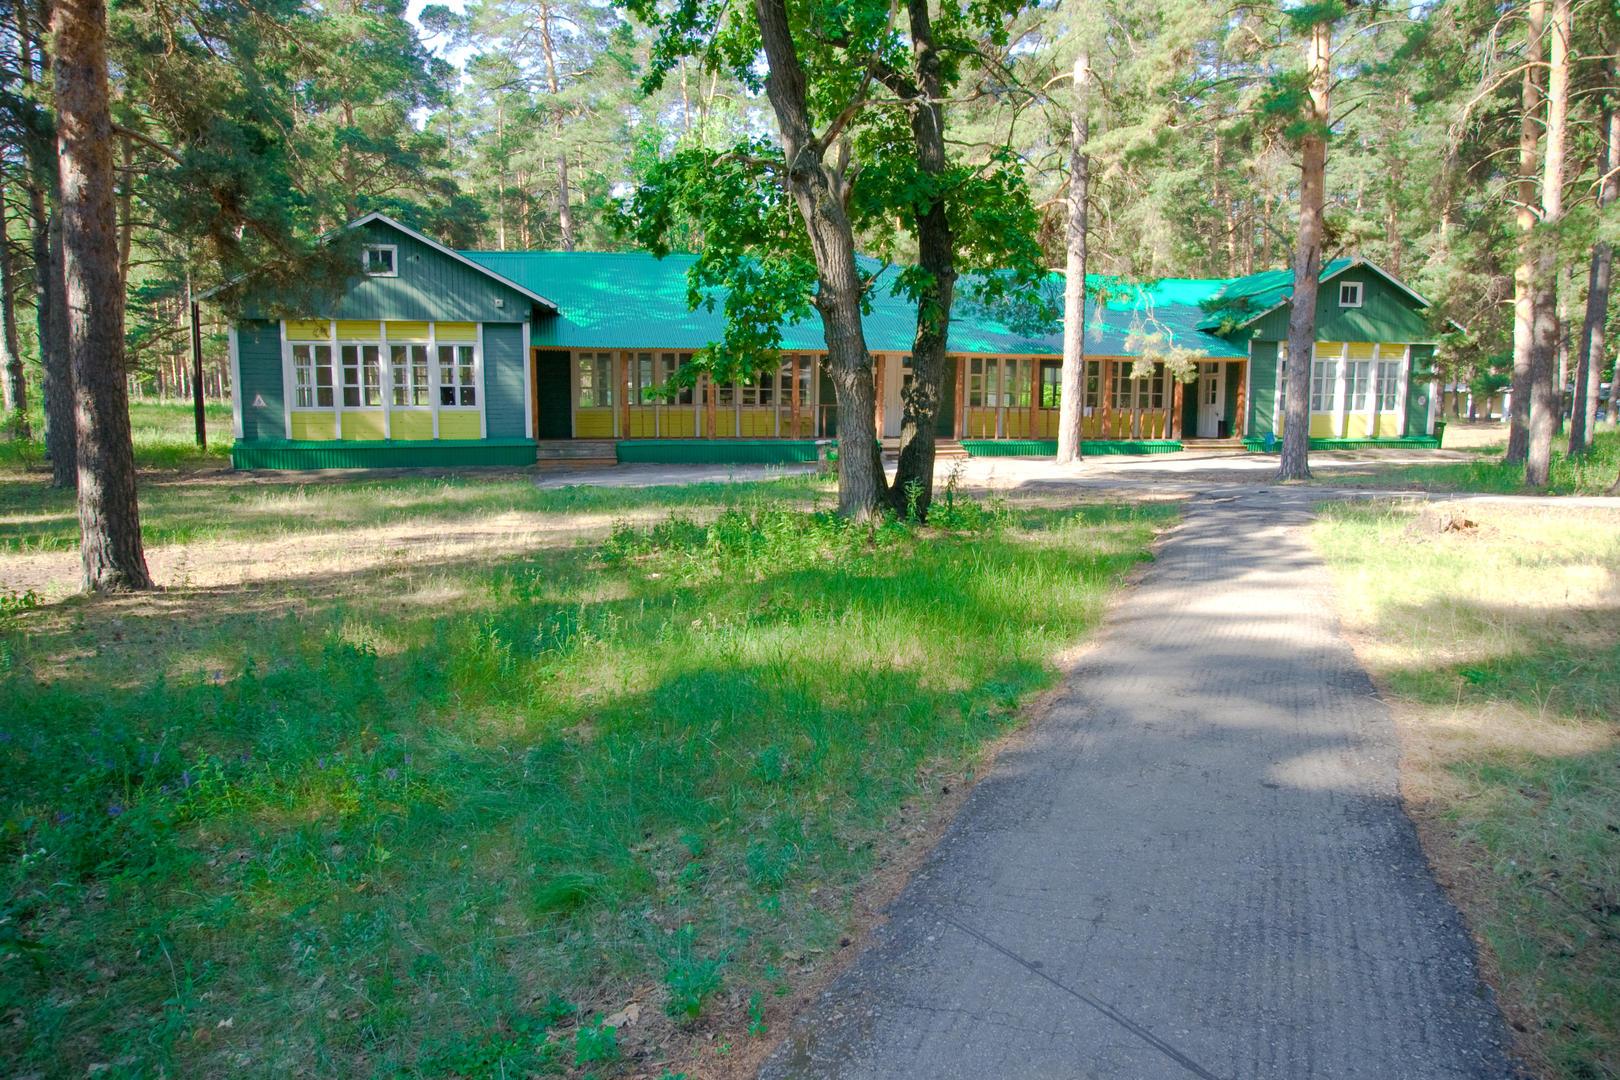 База отдыха Ял г. Набережные Челны, Боровецкий лес 96